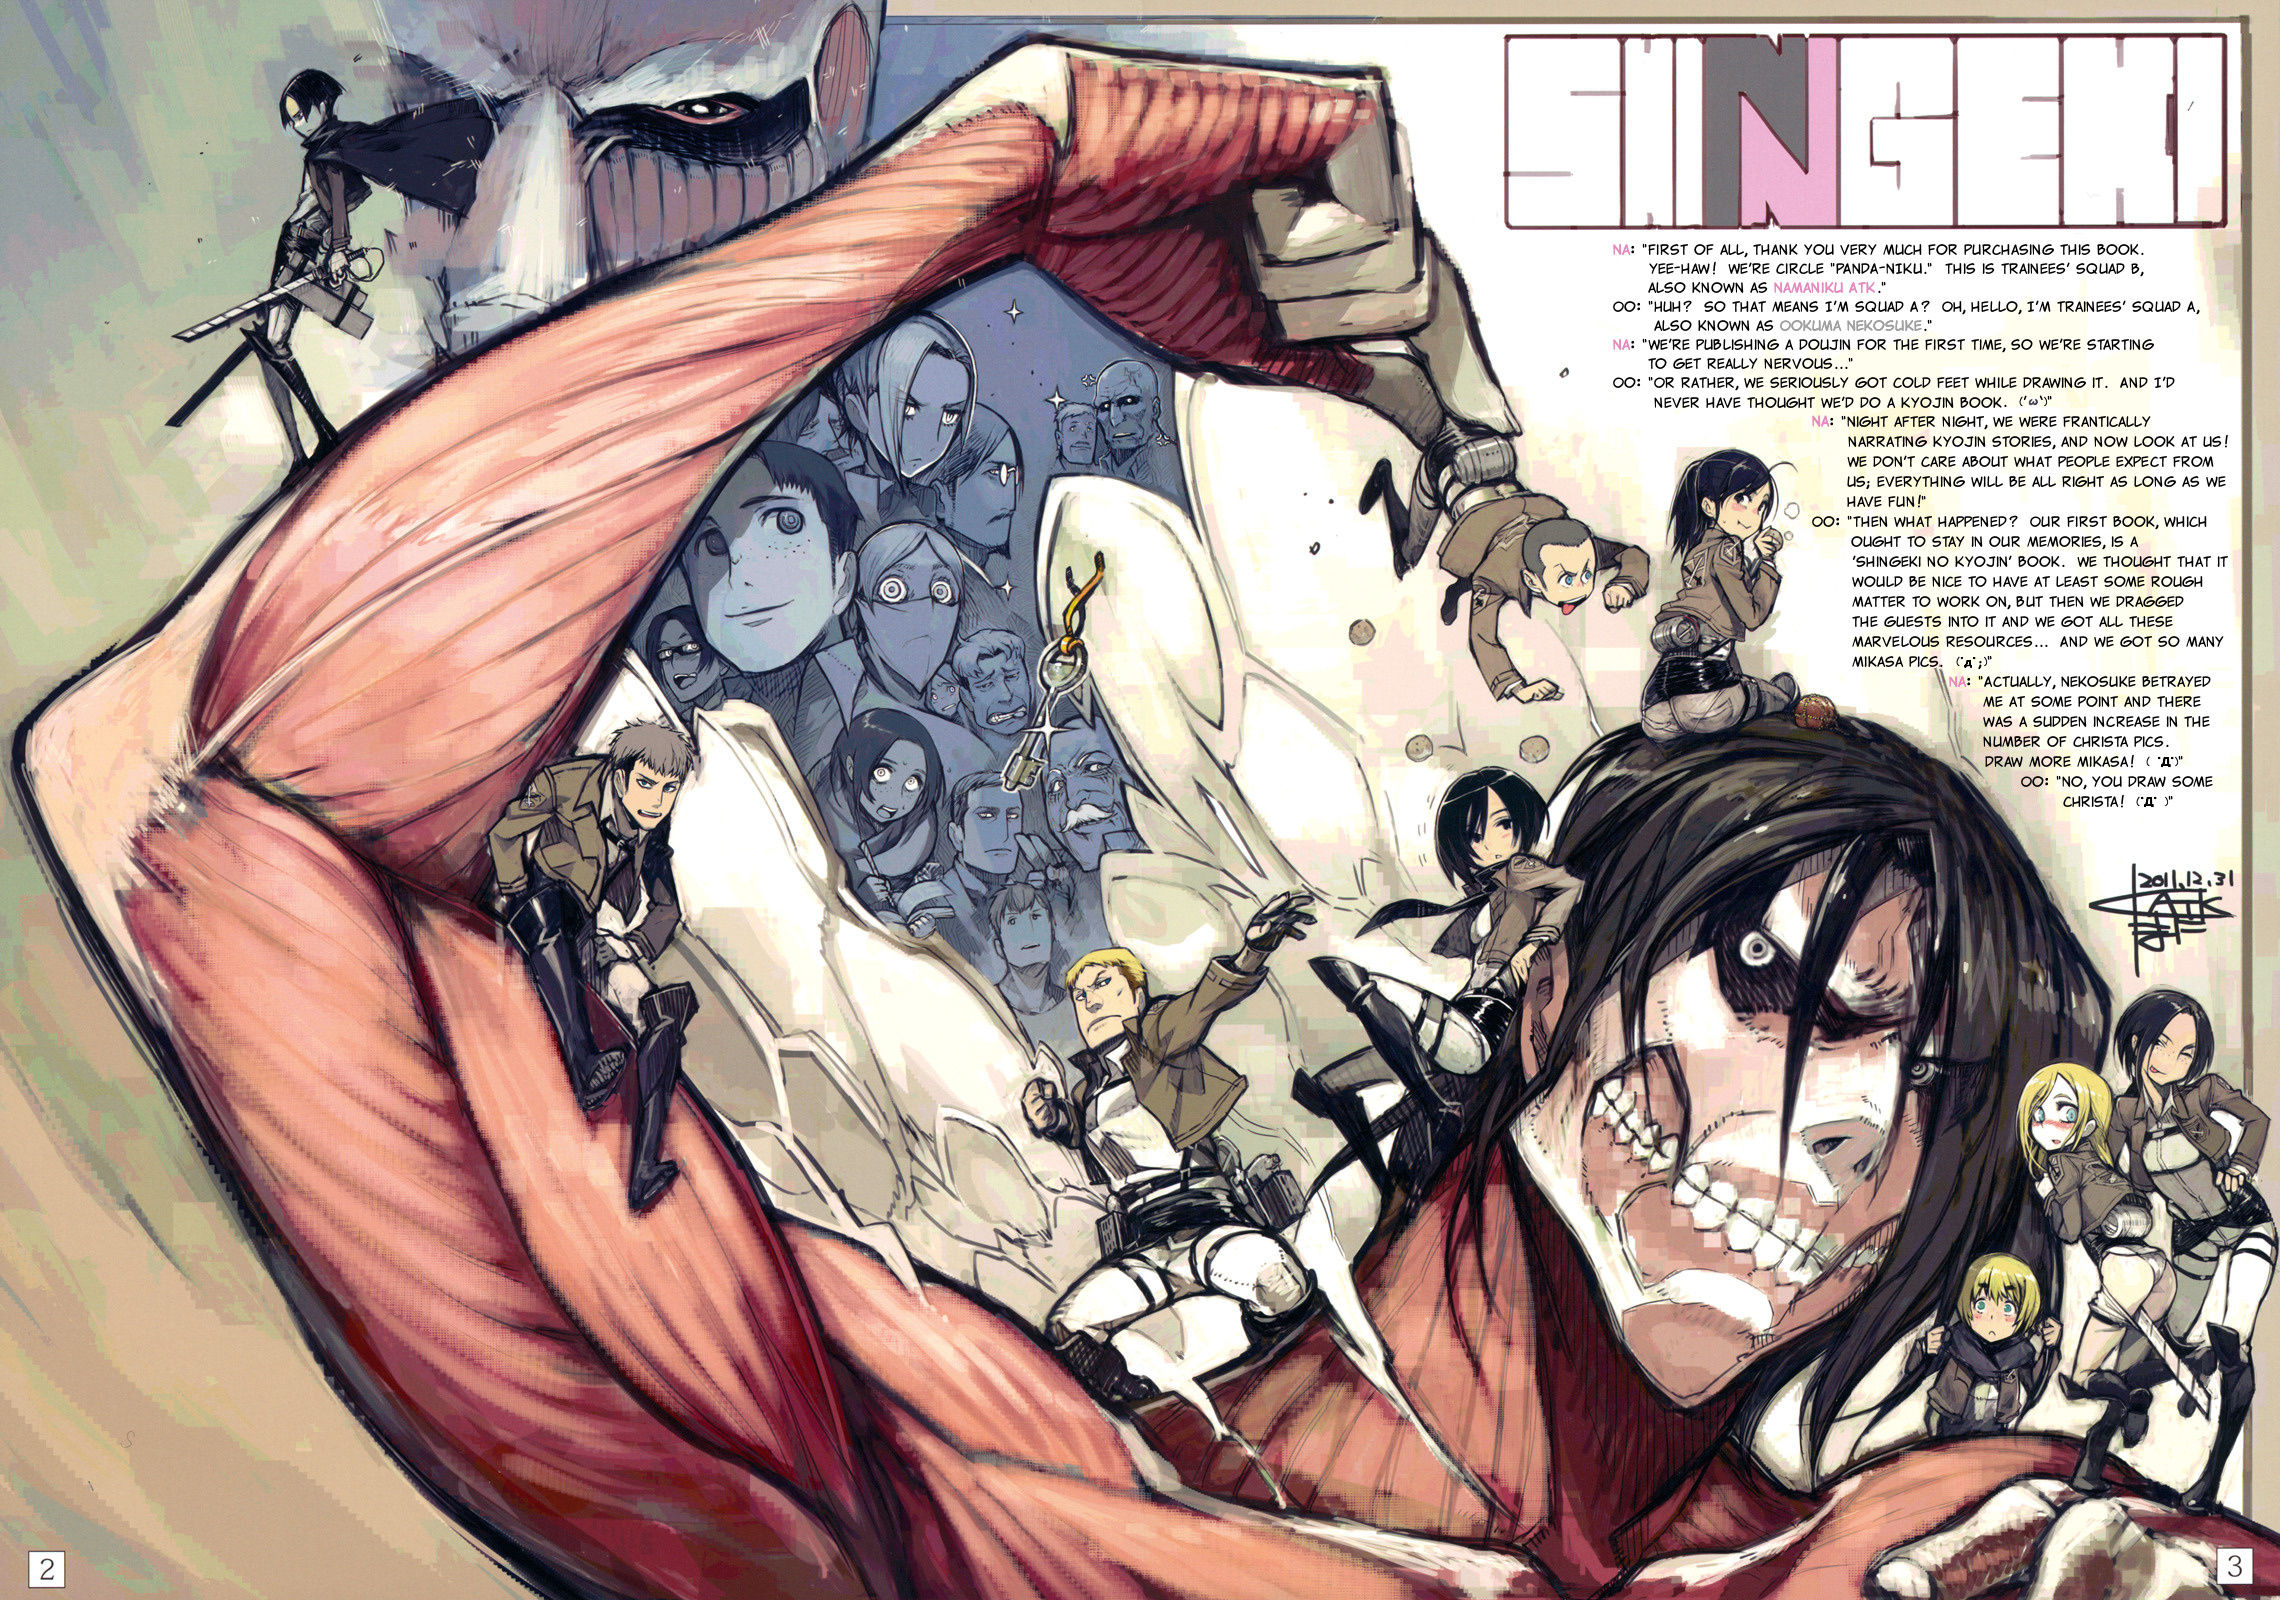 Shinngeki vol 1 hentai manga picture 02